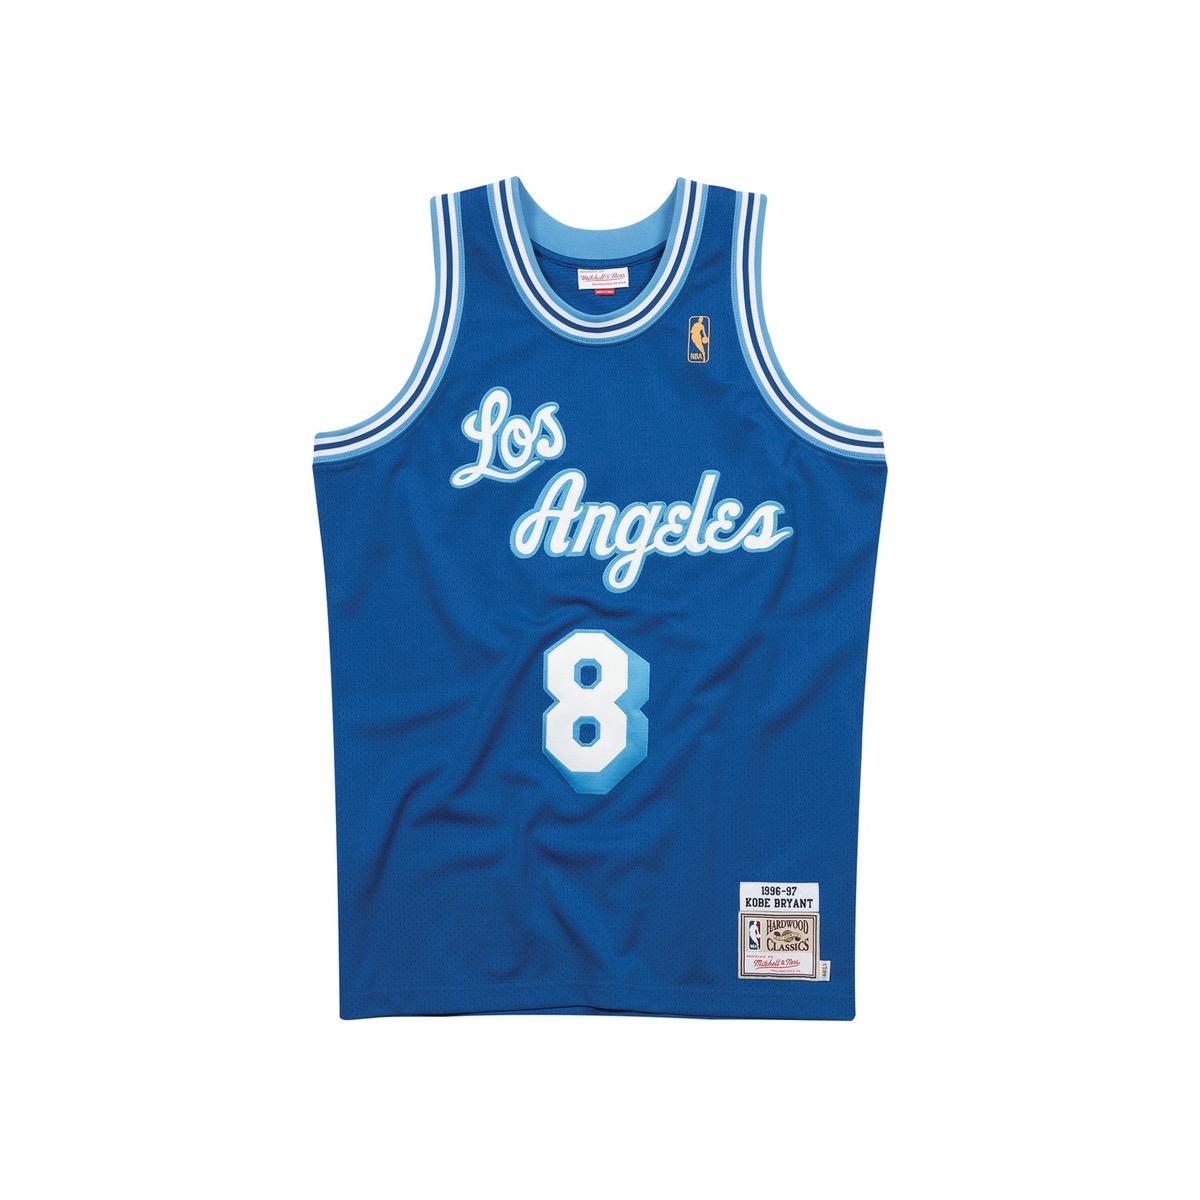 Mitchell & Ness Kobe Bryant L.A Lakers Royal Blue #8 Jersey BNWT